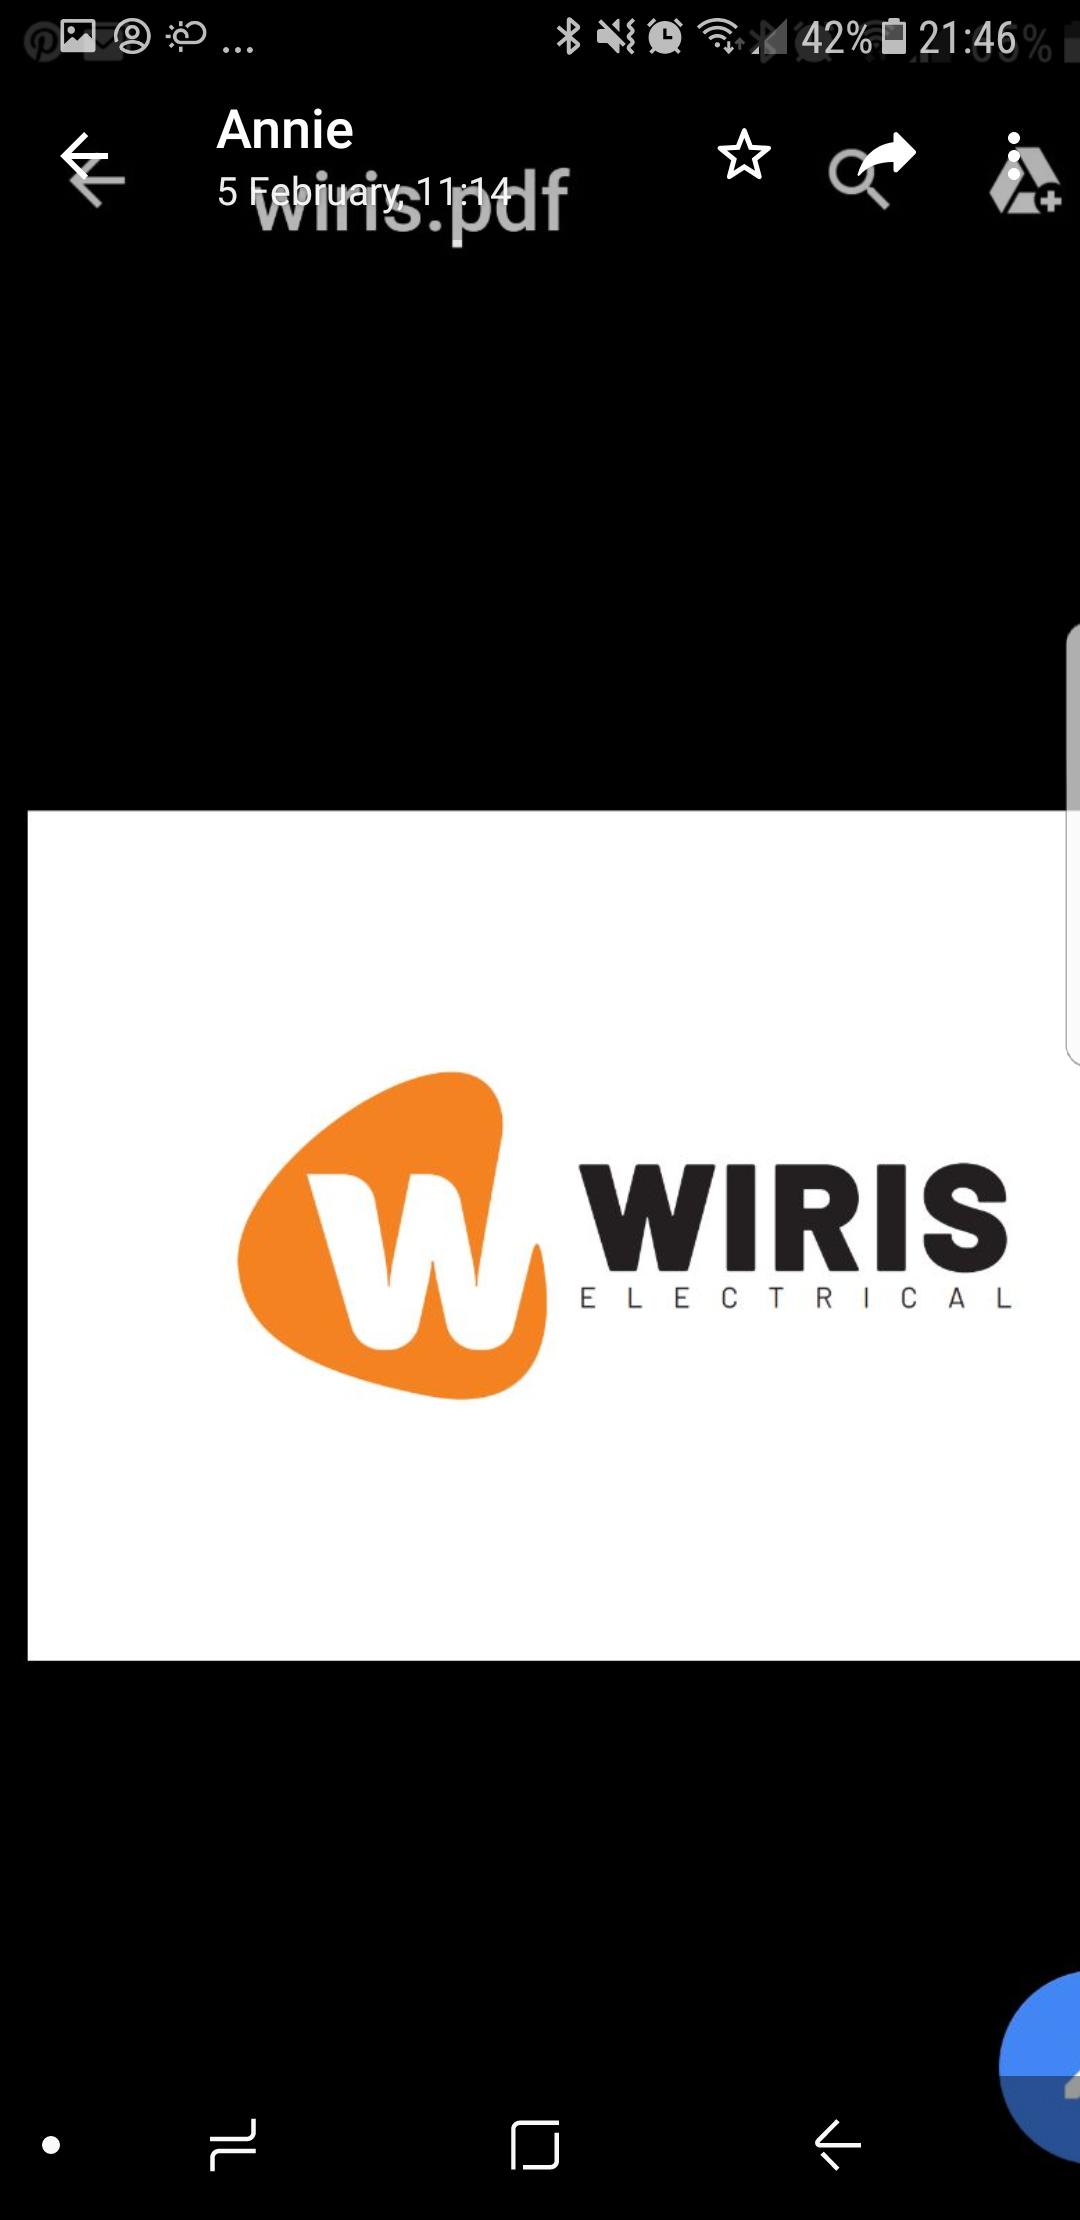 Wiris Electrical Ltd